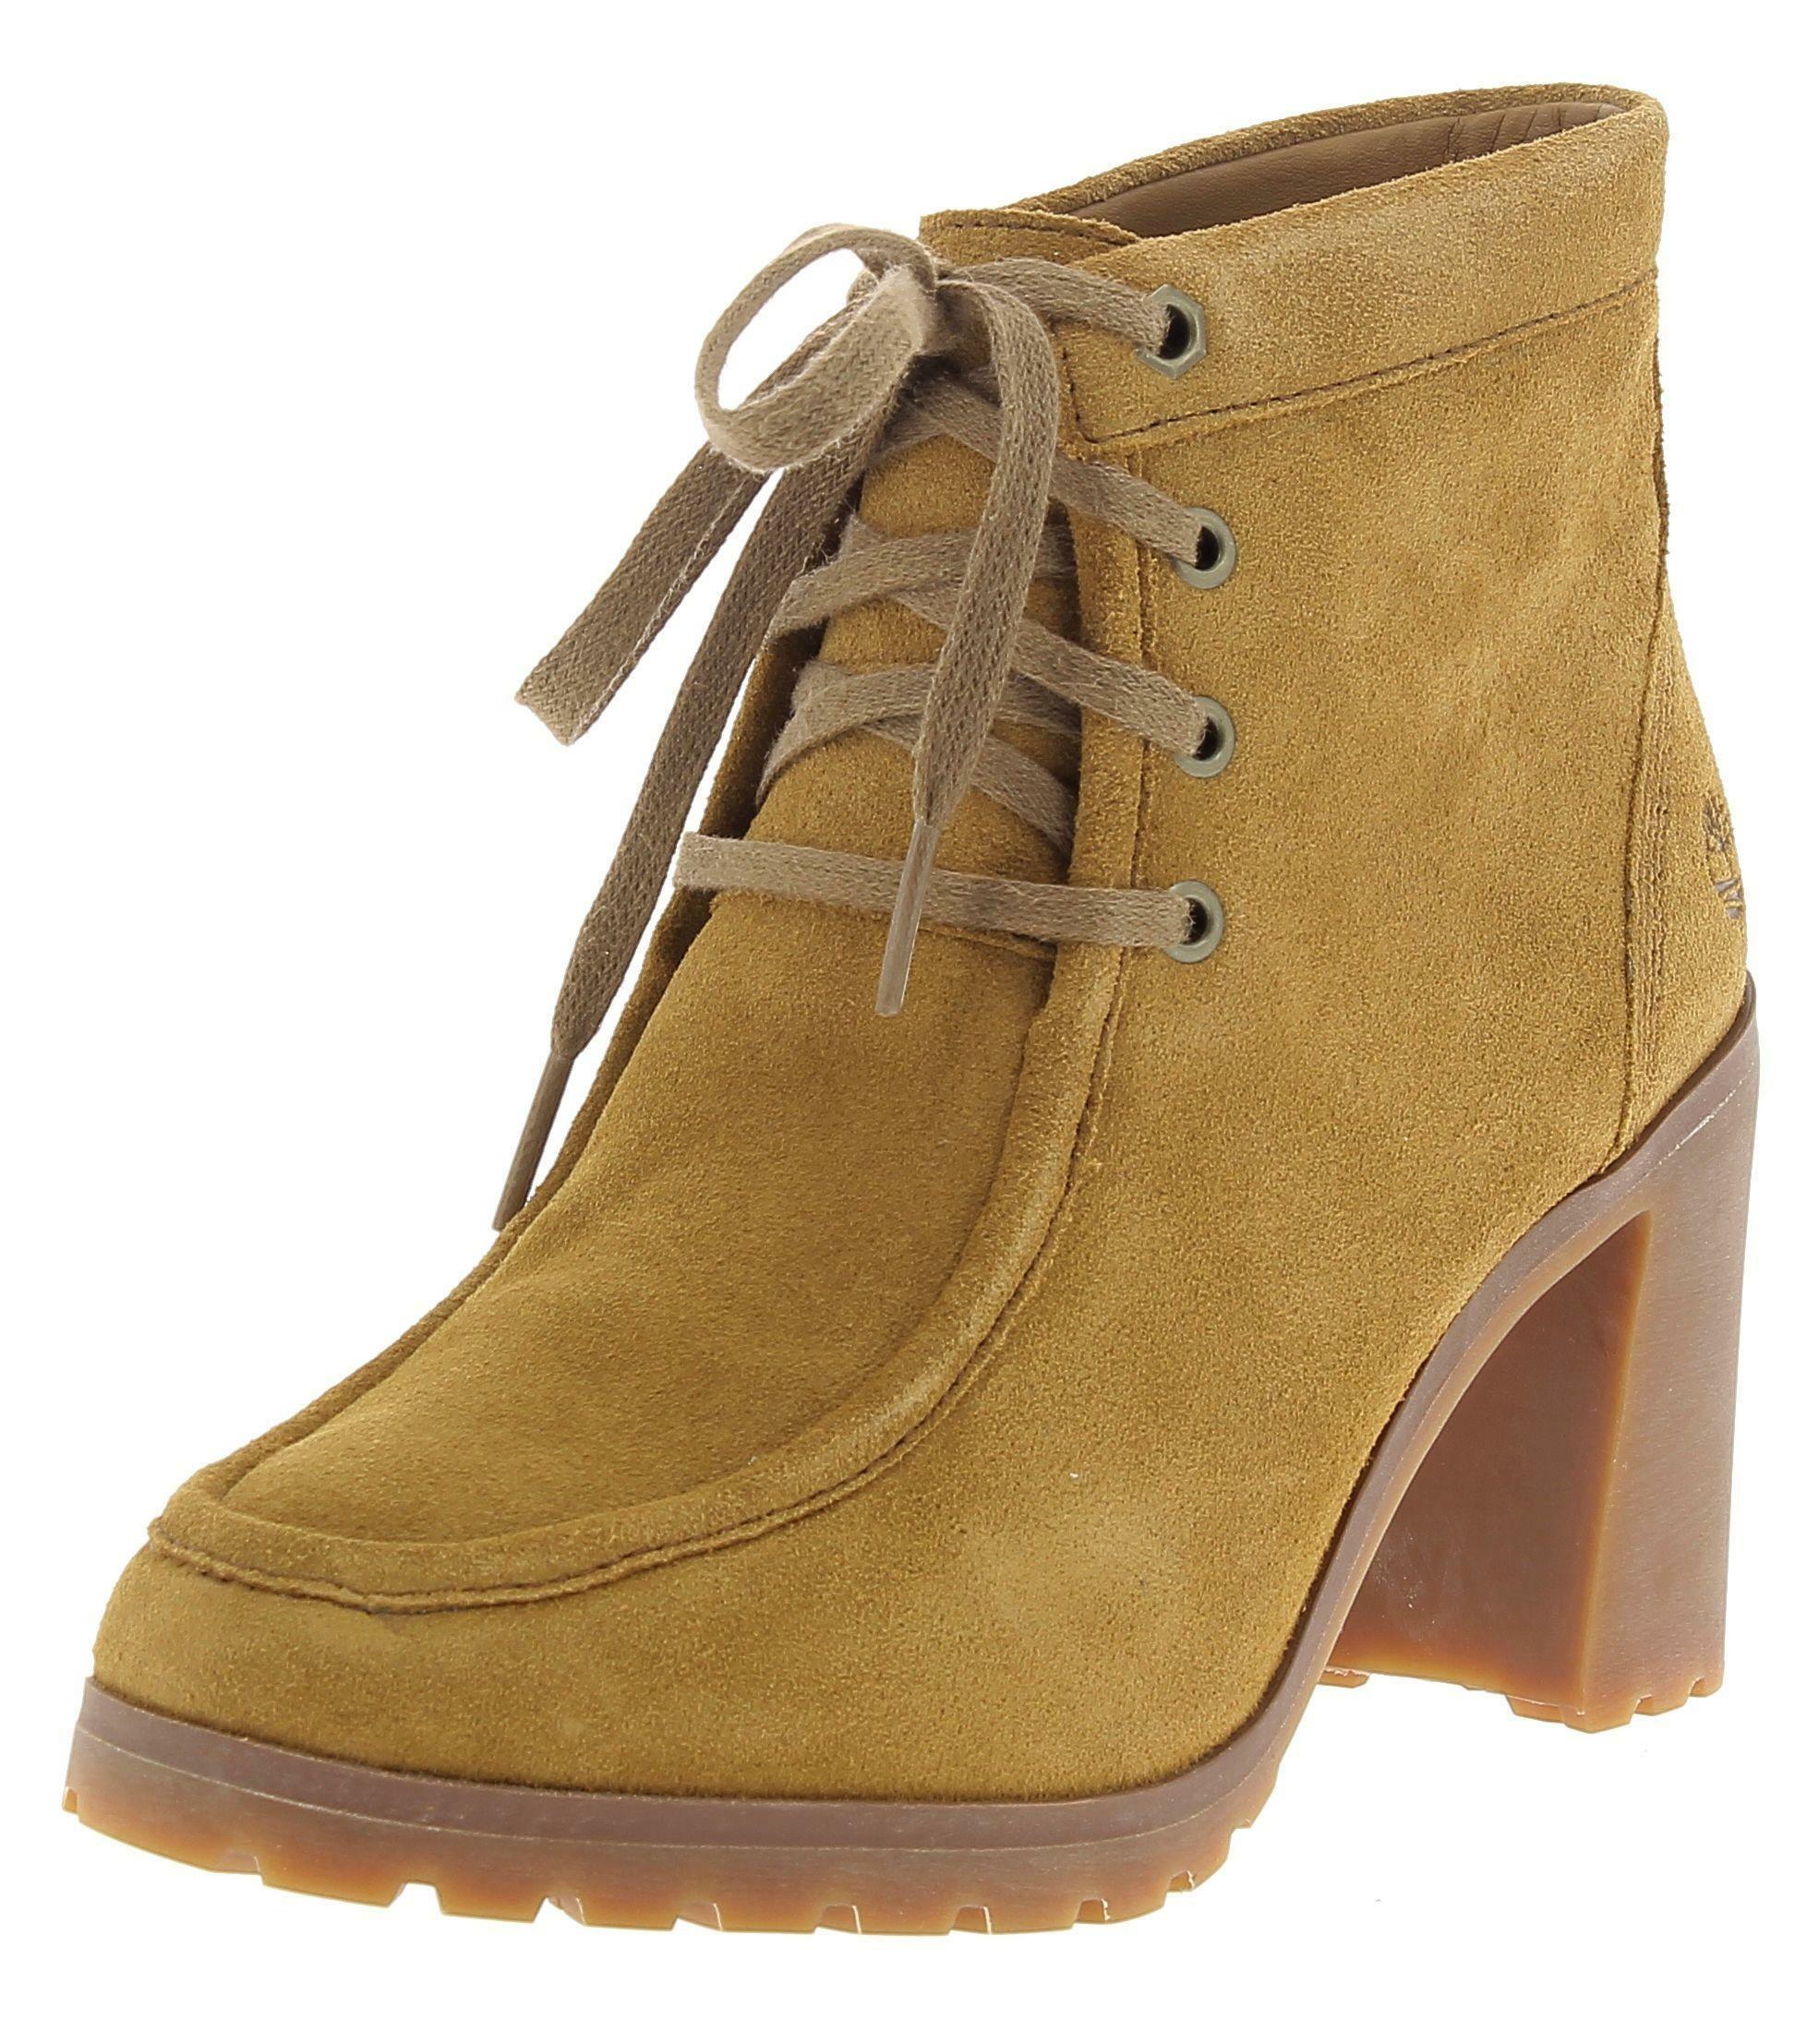 promo code e5541 508f7 Timberland allington chukka stivaletti donna gialli